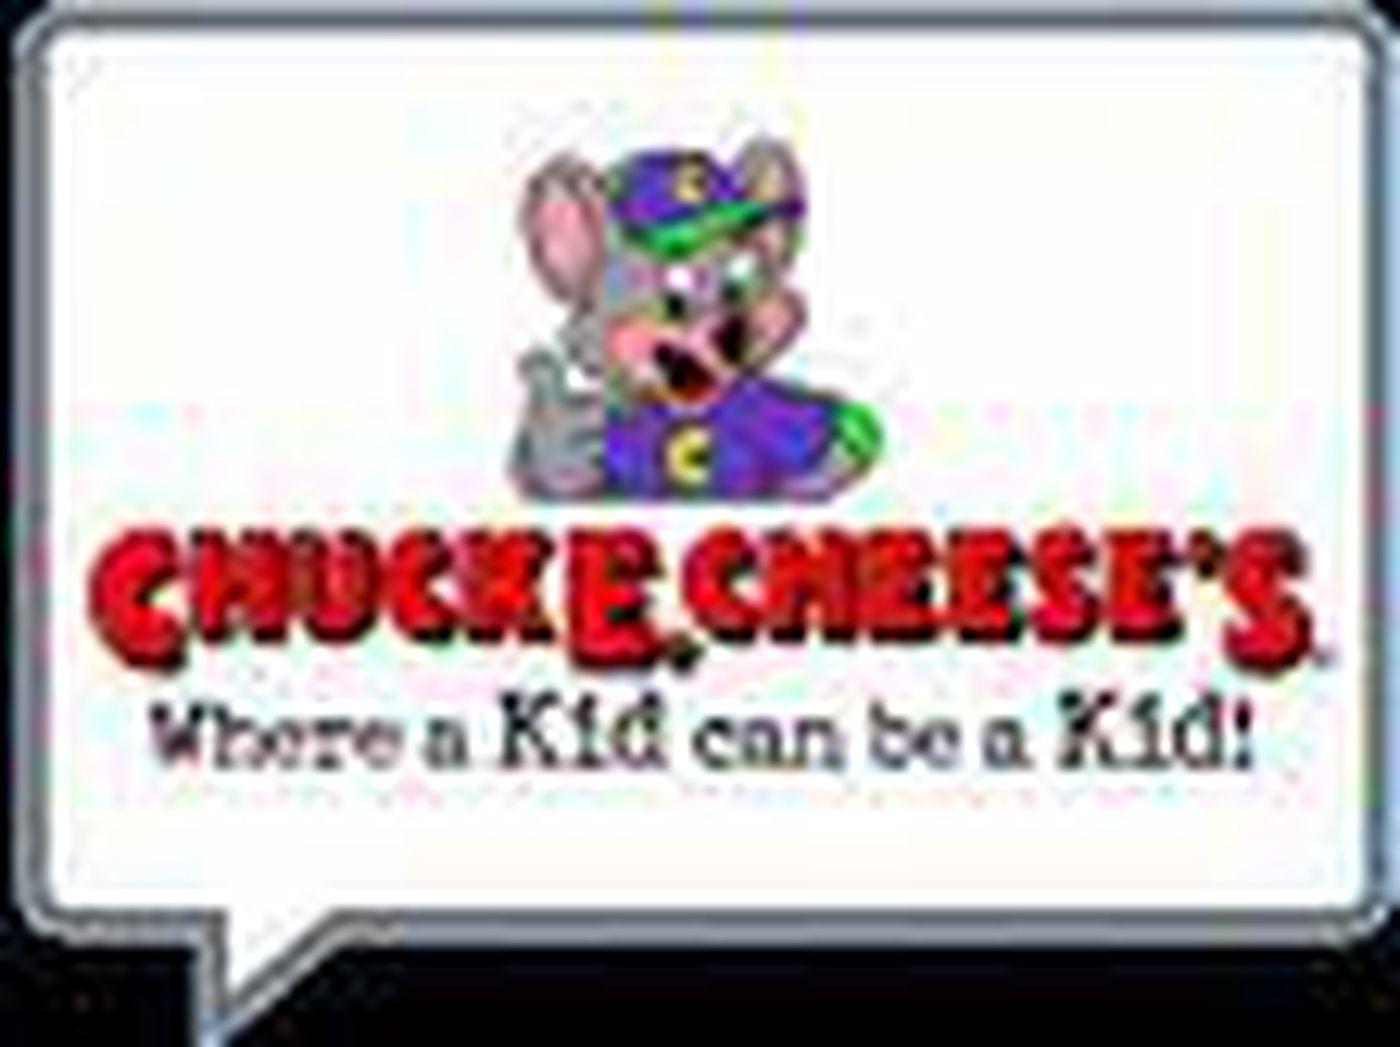 3 Year Old Boy Killed At Chuck E Cheese